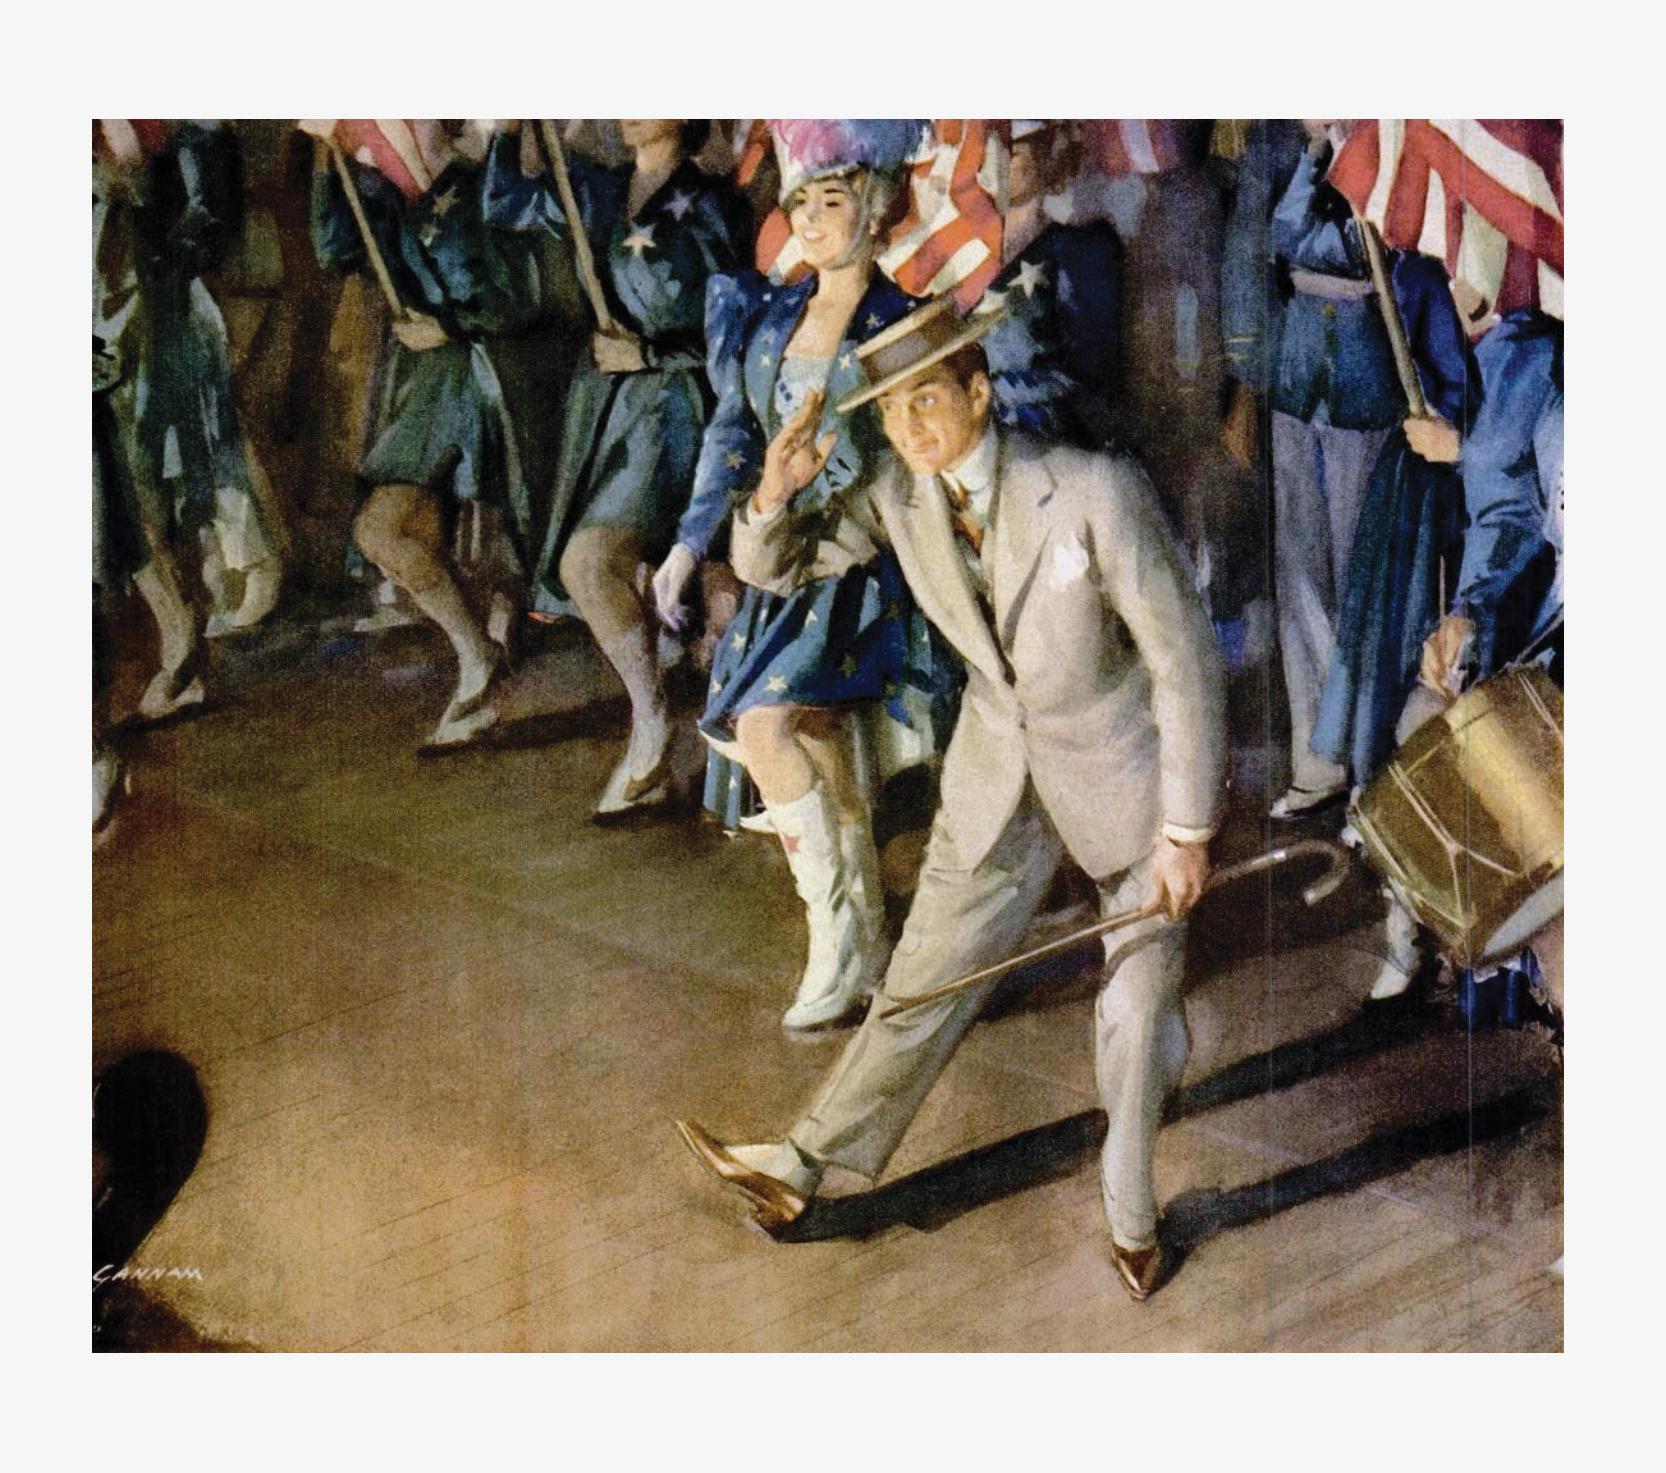 The Good Life recalls an ad from John Hancock celebrating 'Yankee Doodle Boy'